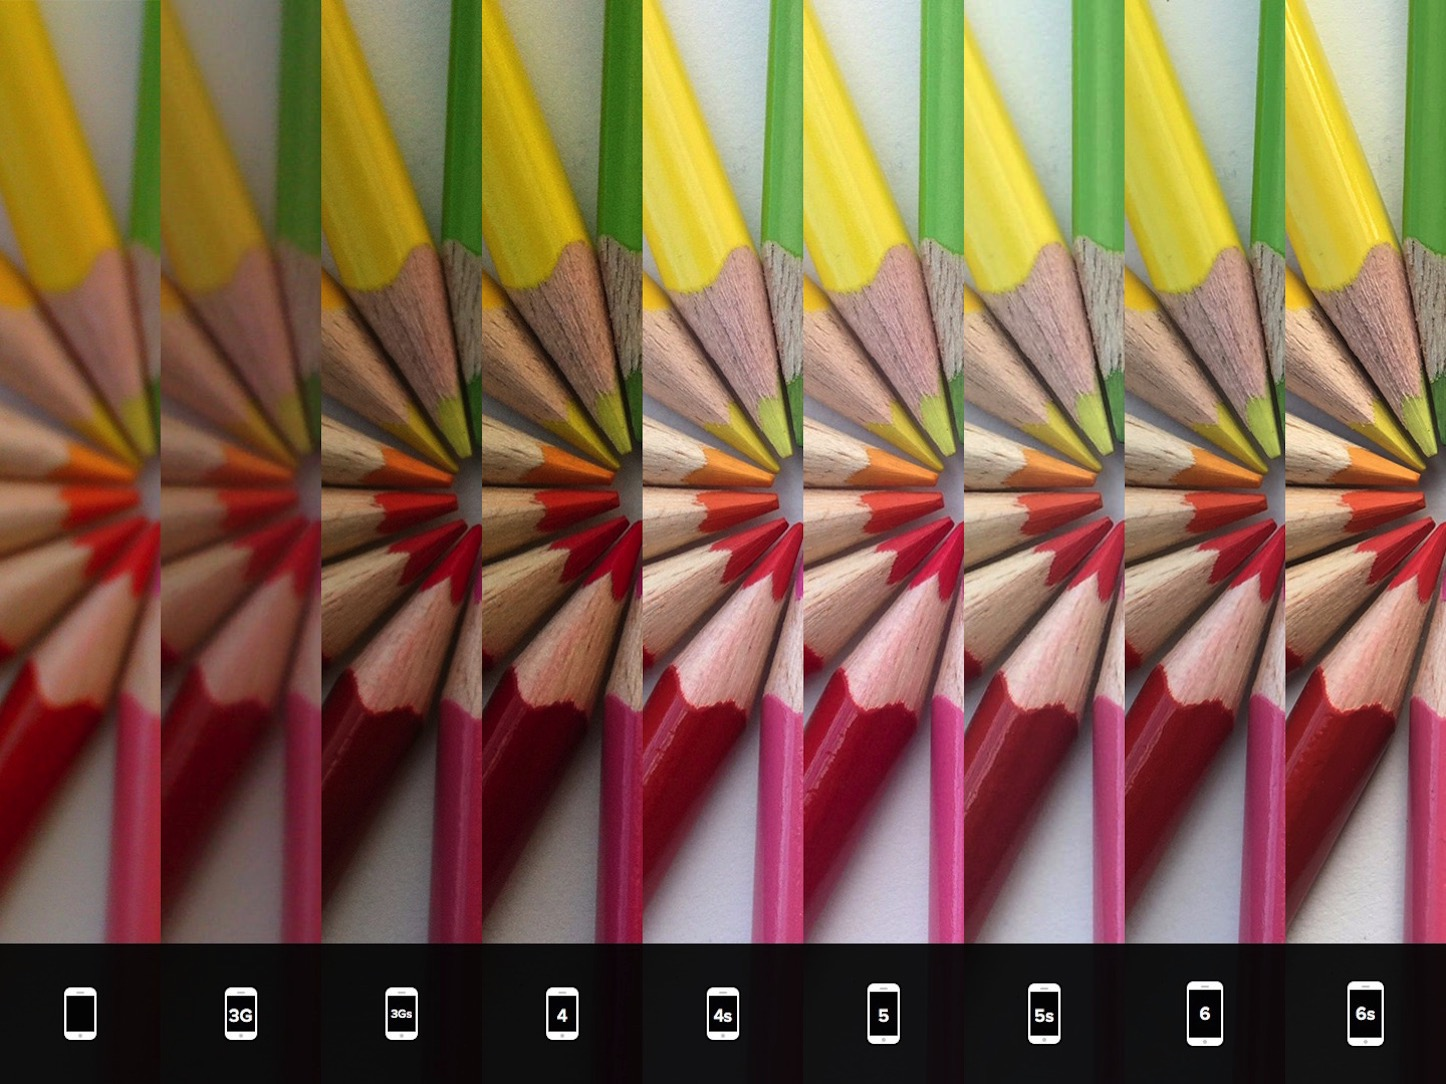 IPhone Camera Comparison